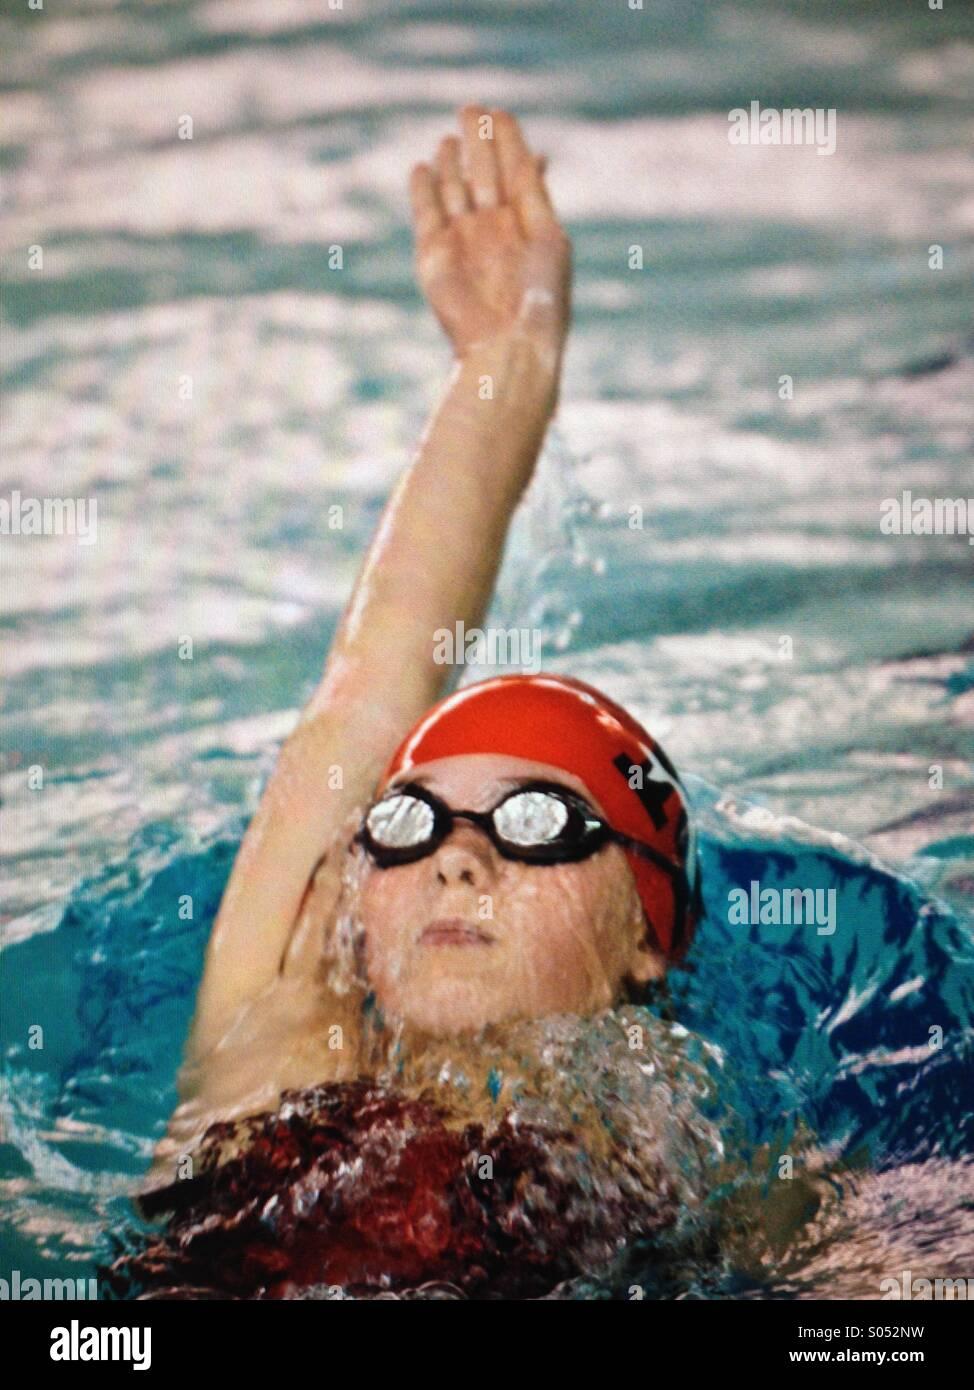 Nuoto Immagini Stock